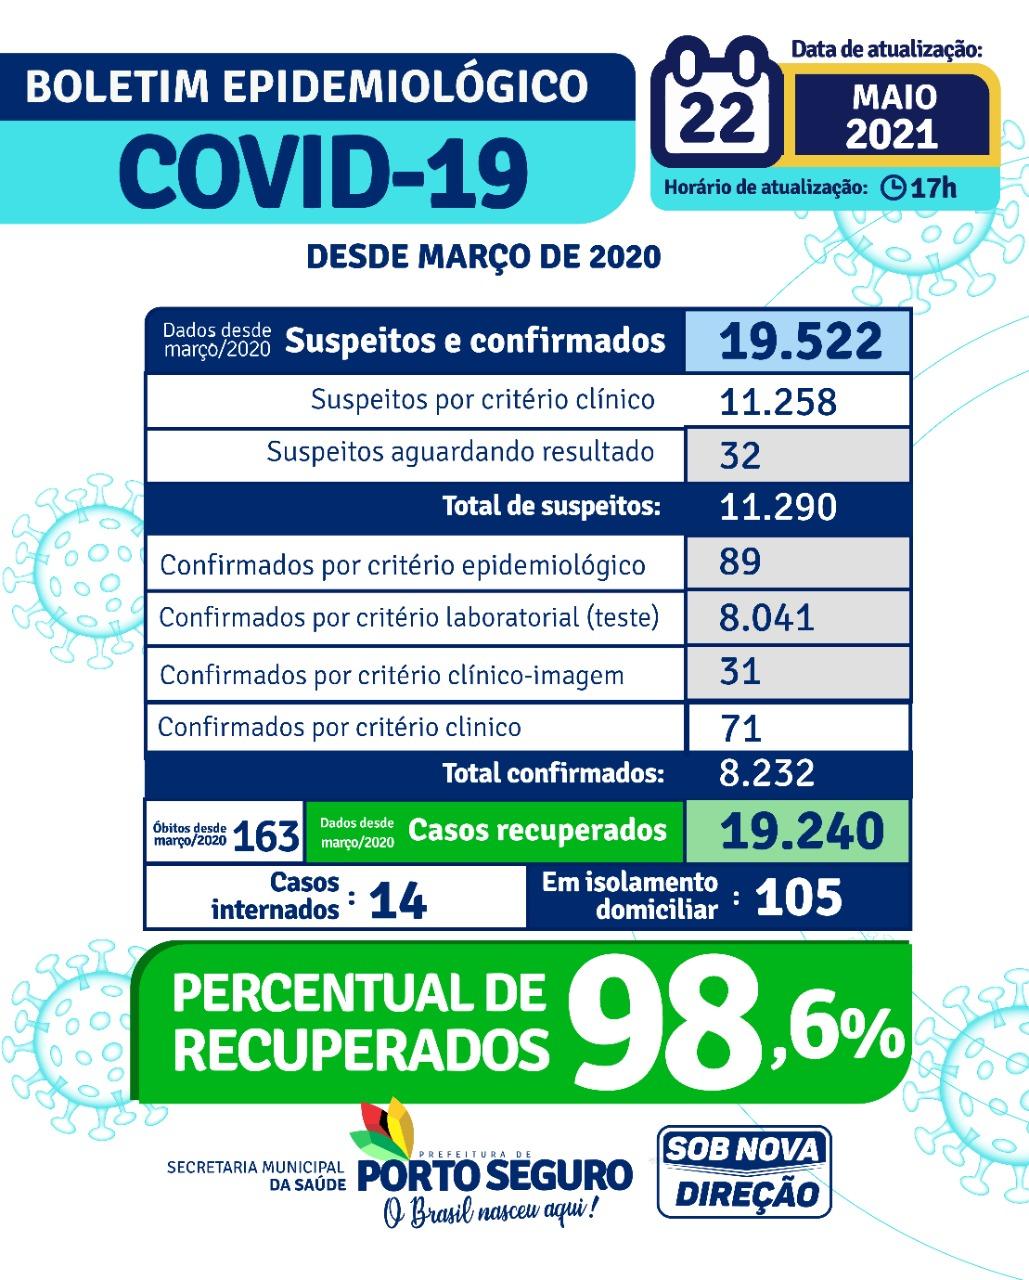 Porto Seguro: Boletim Epidemiológico Covid-19 (22/05/2021) 23